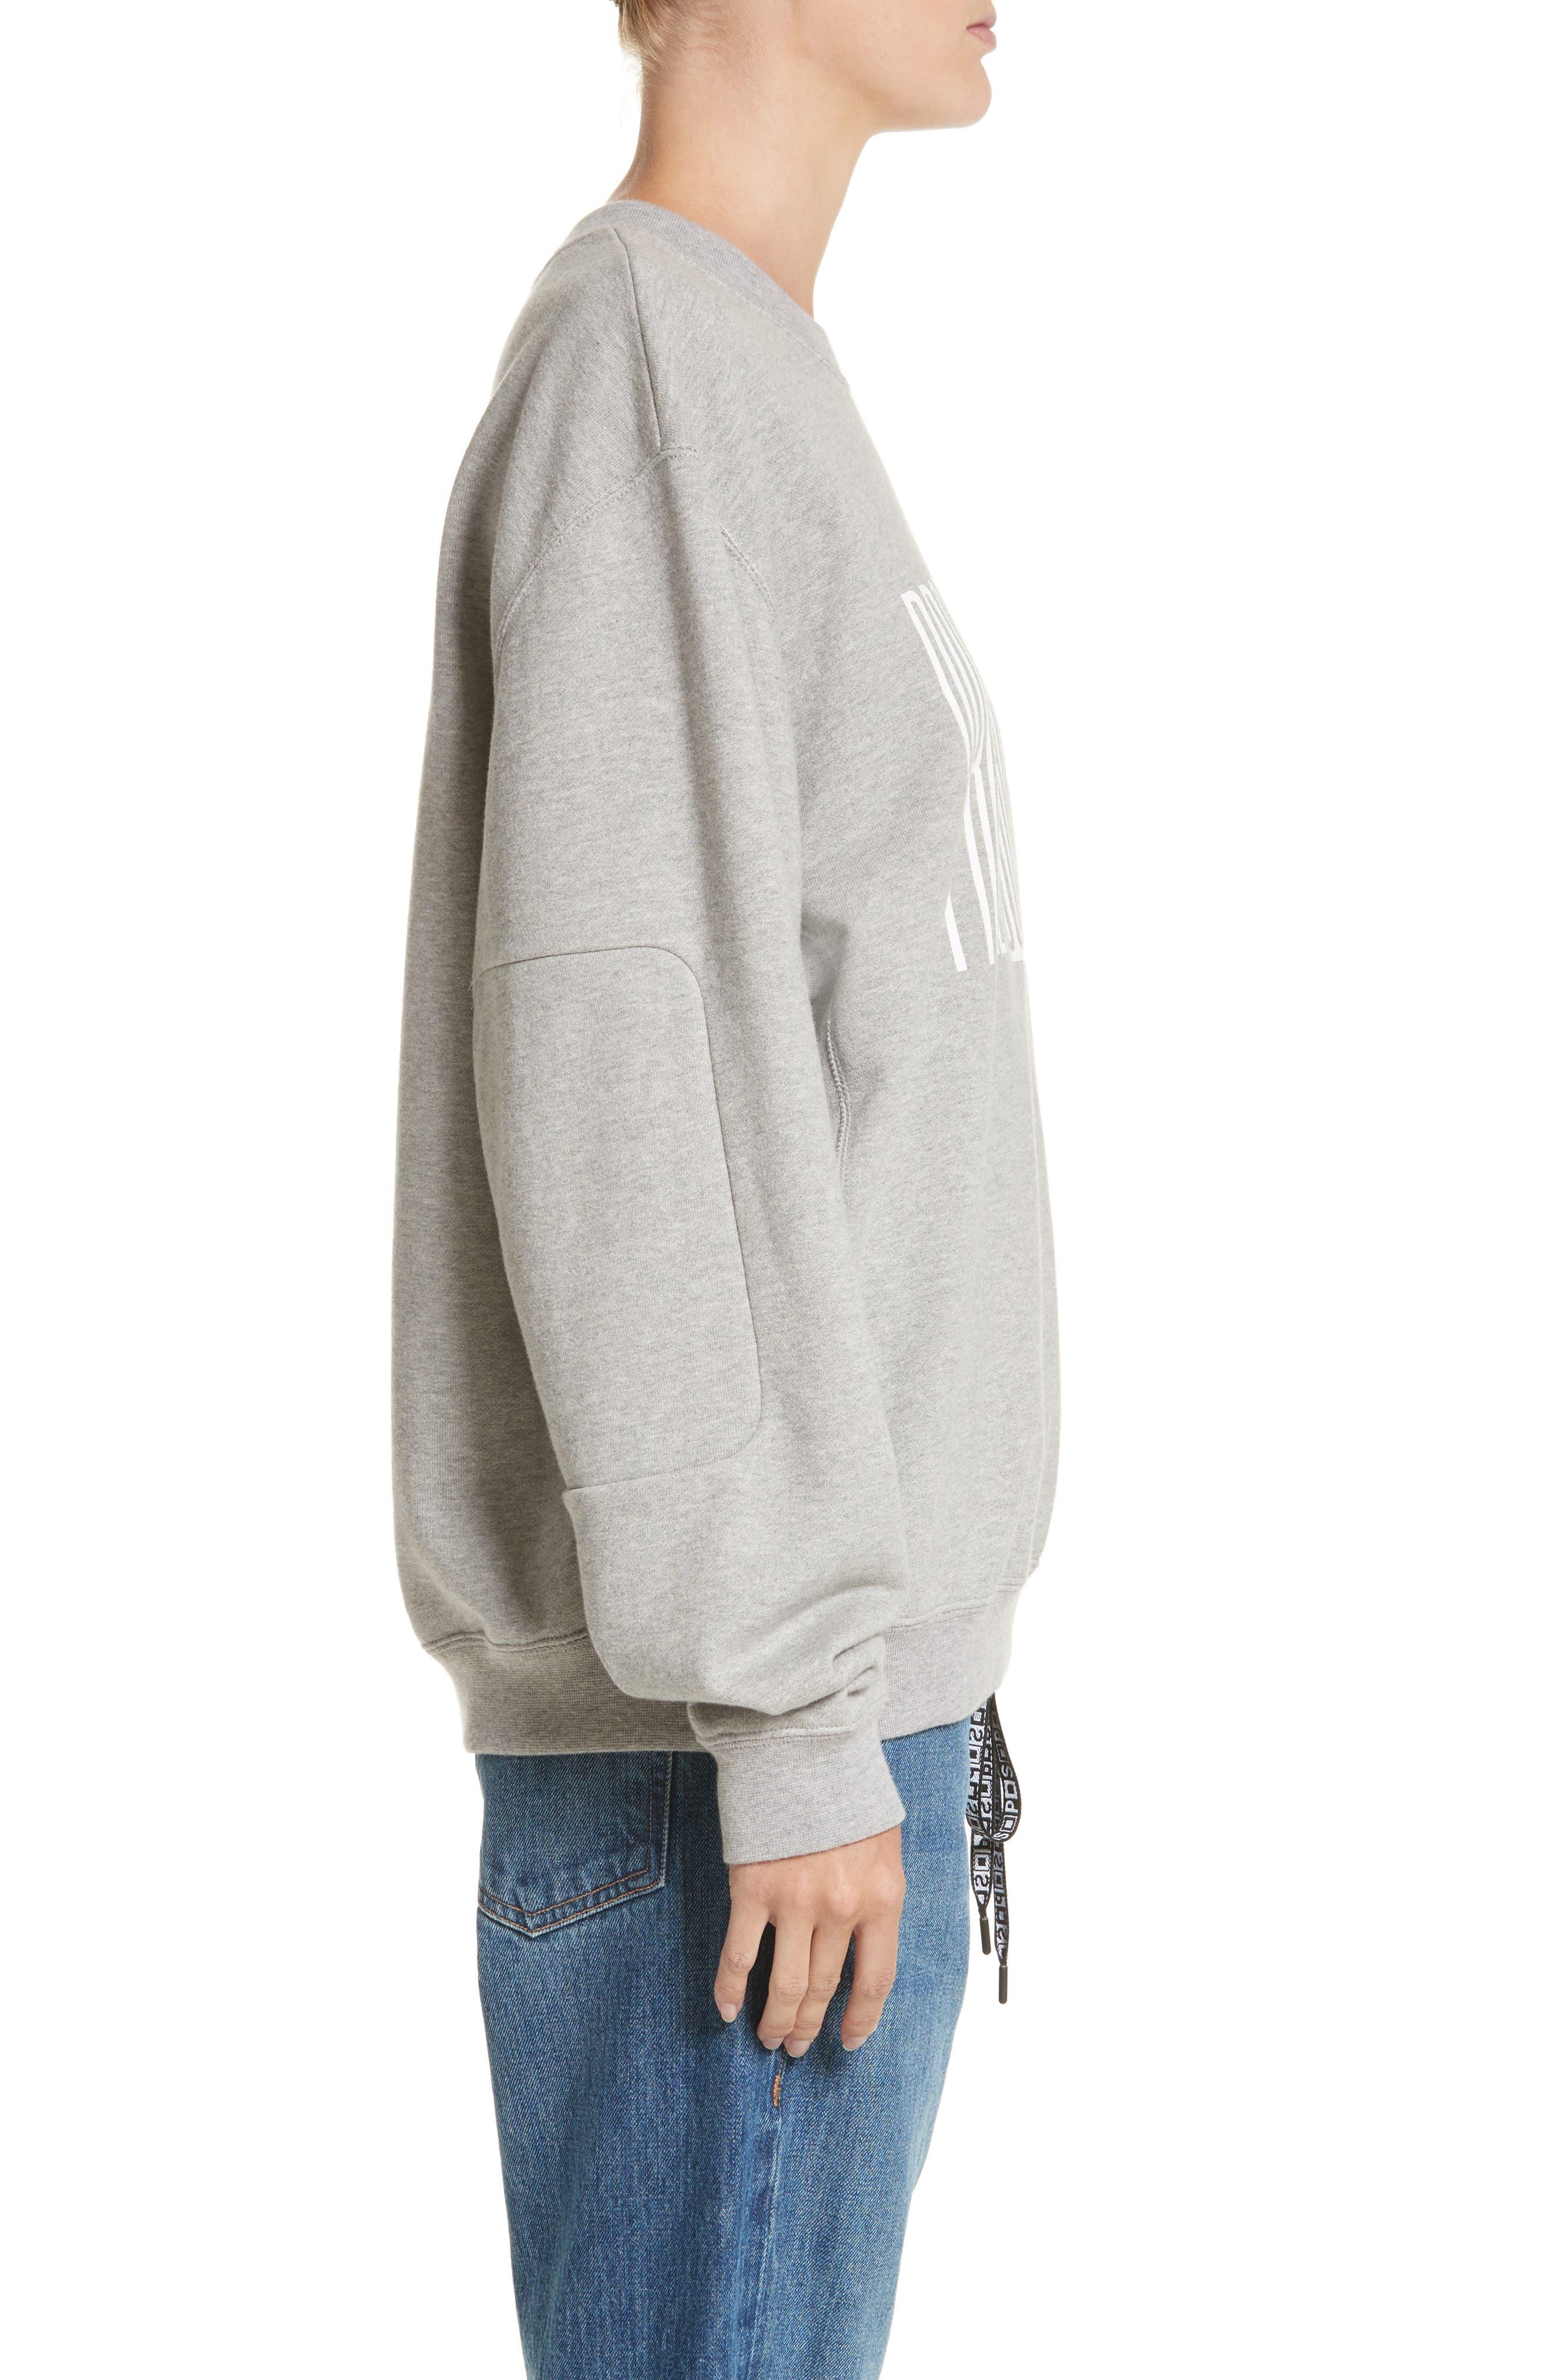 PSWL Graphic Jersey Oversize Sweatshirt,                             Alternate thumbnail 4, color,                             082